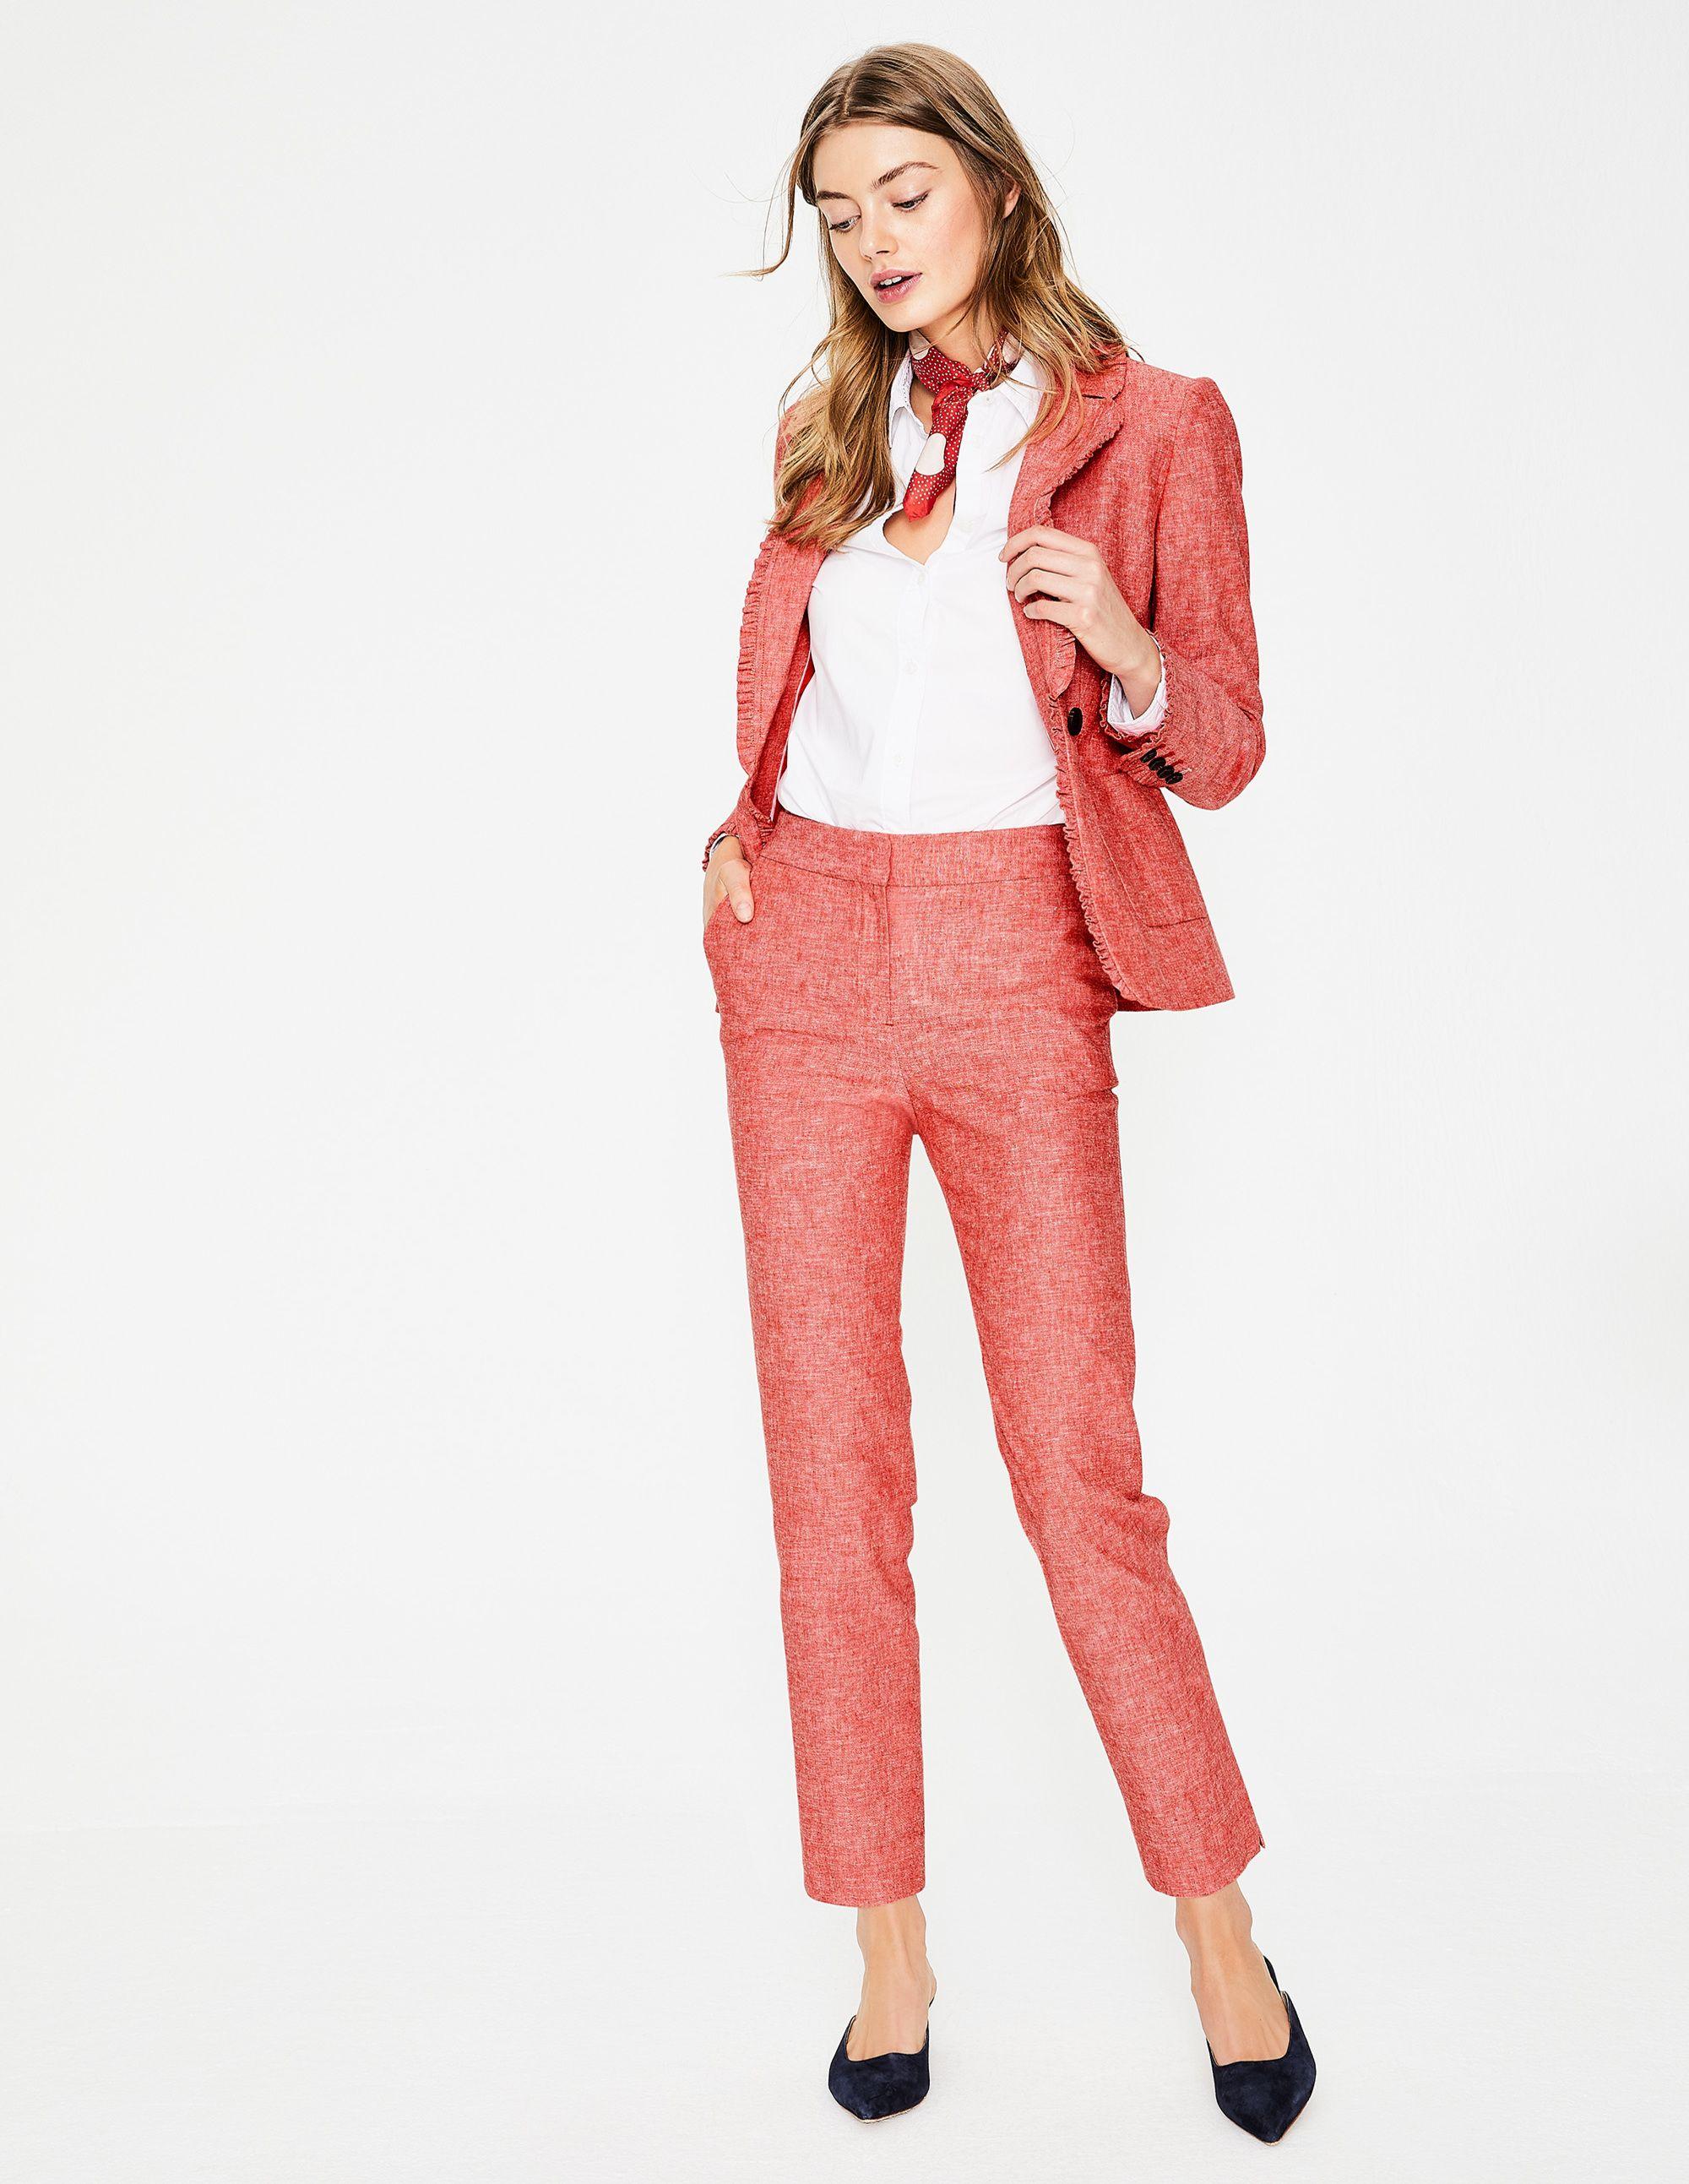 Boden Mina 7 8 Hose Damen Boden Rot Mode Ootd Outfit Fashion